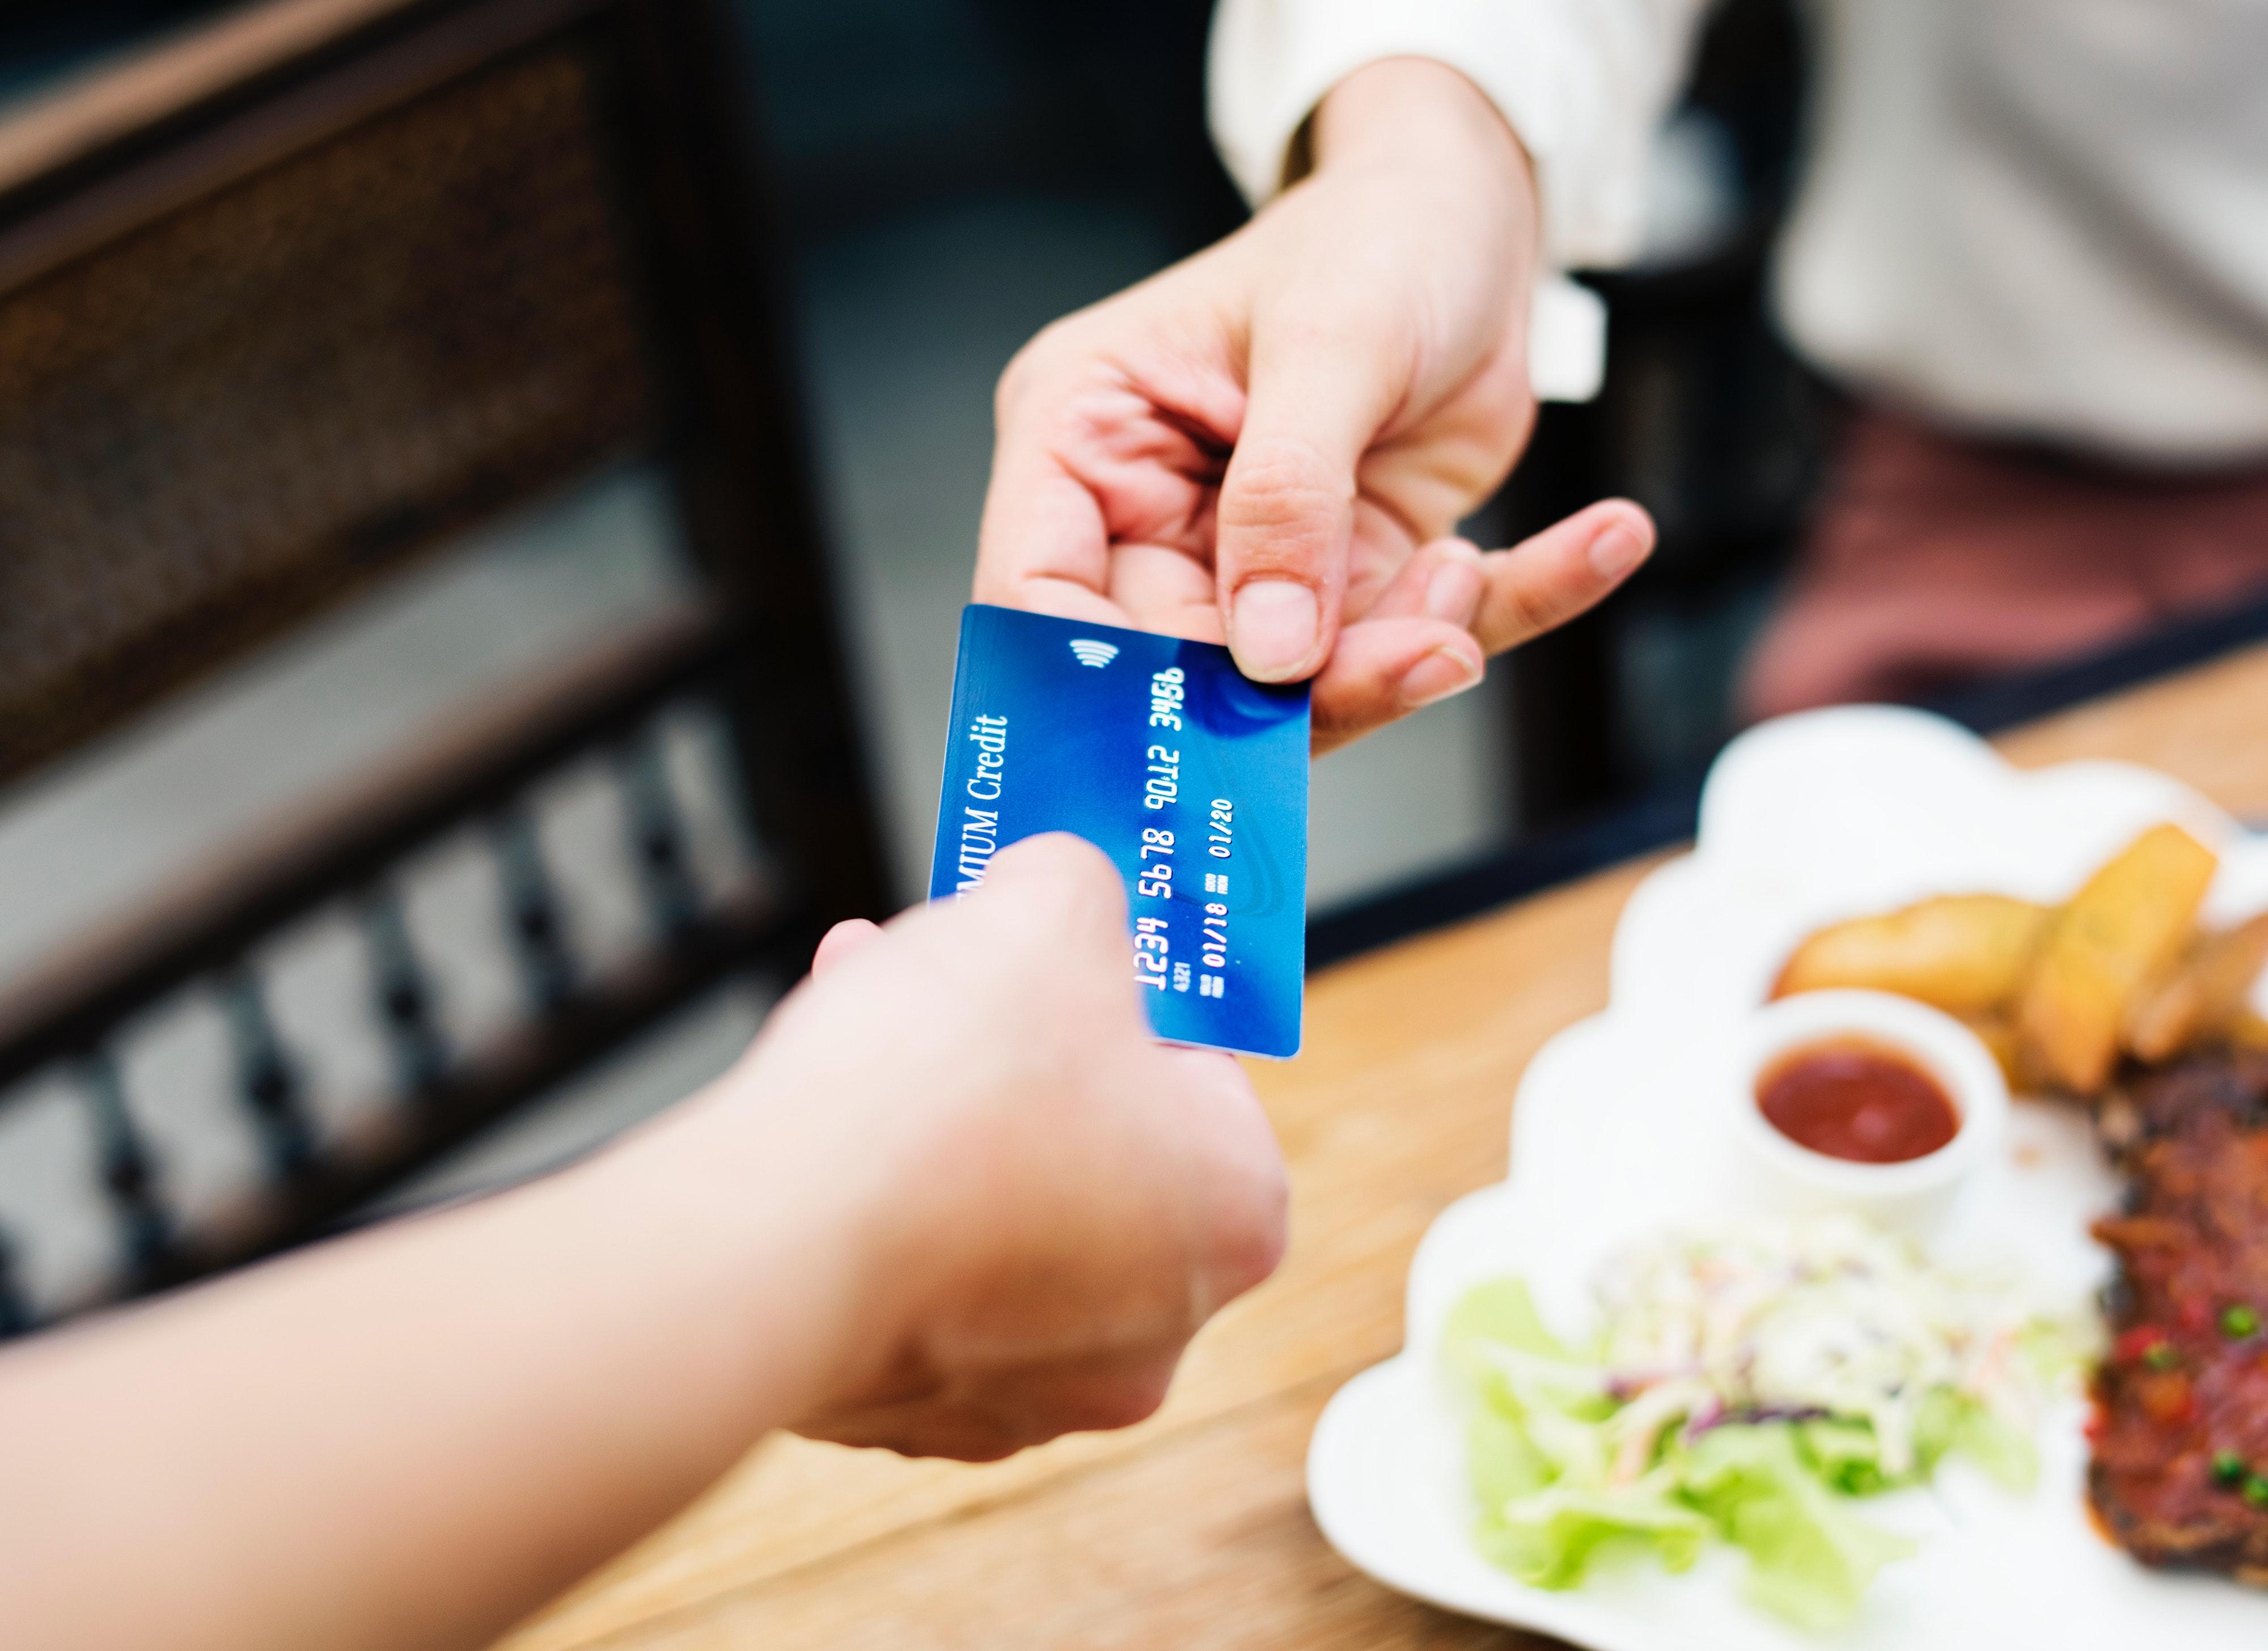 banking-card-credit-card-1332191 (1)